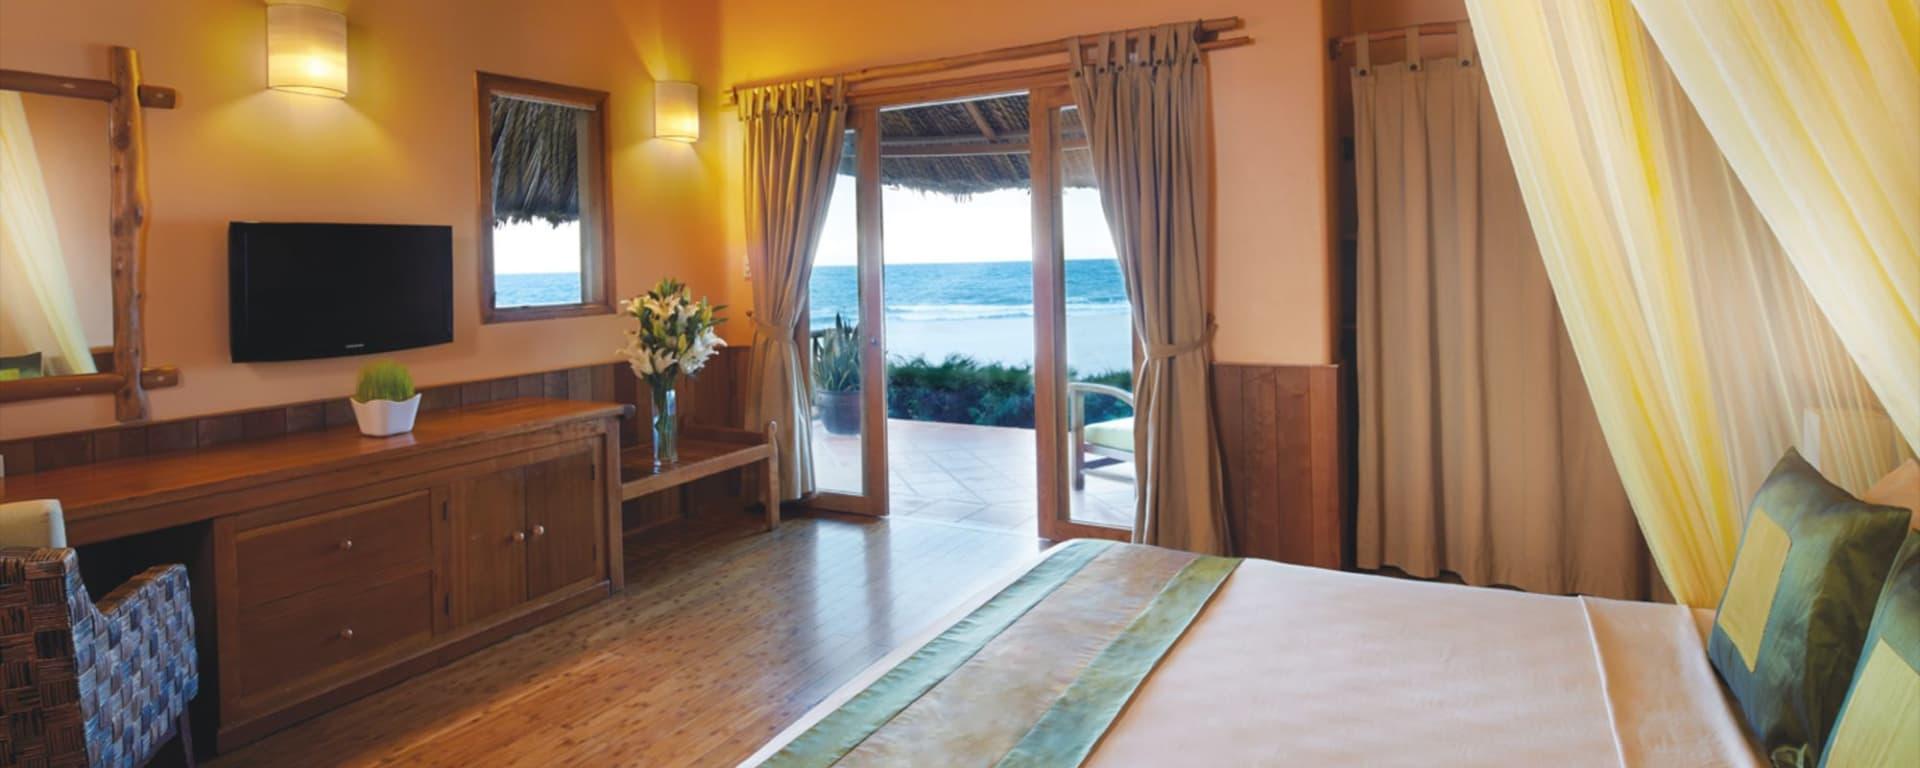 Sailing Club Resort Mui Ne in Phan Thiet: Deluxe Beach Front Bungalow